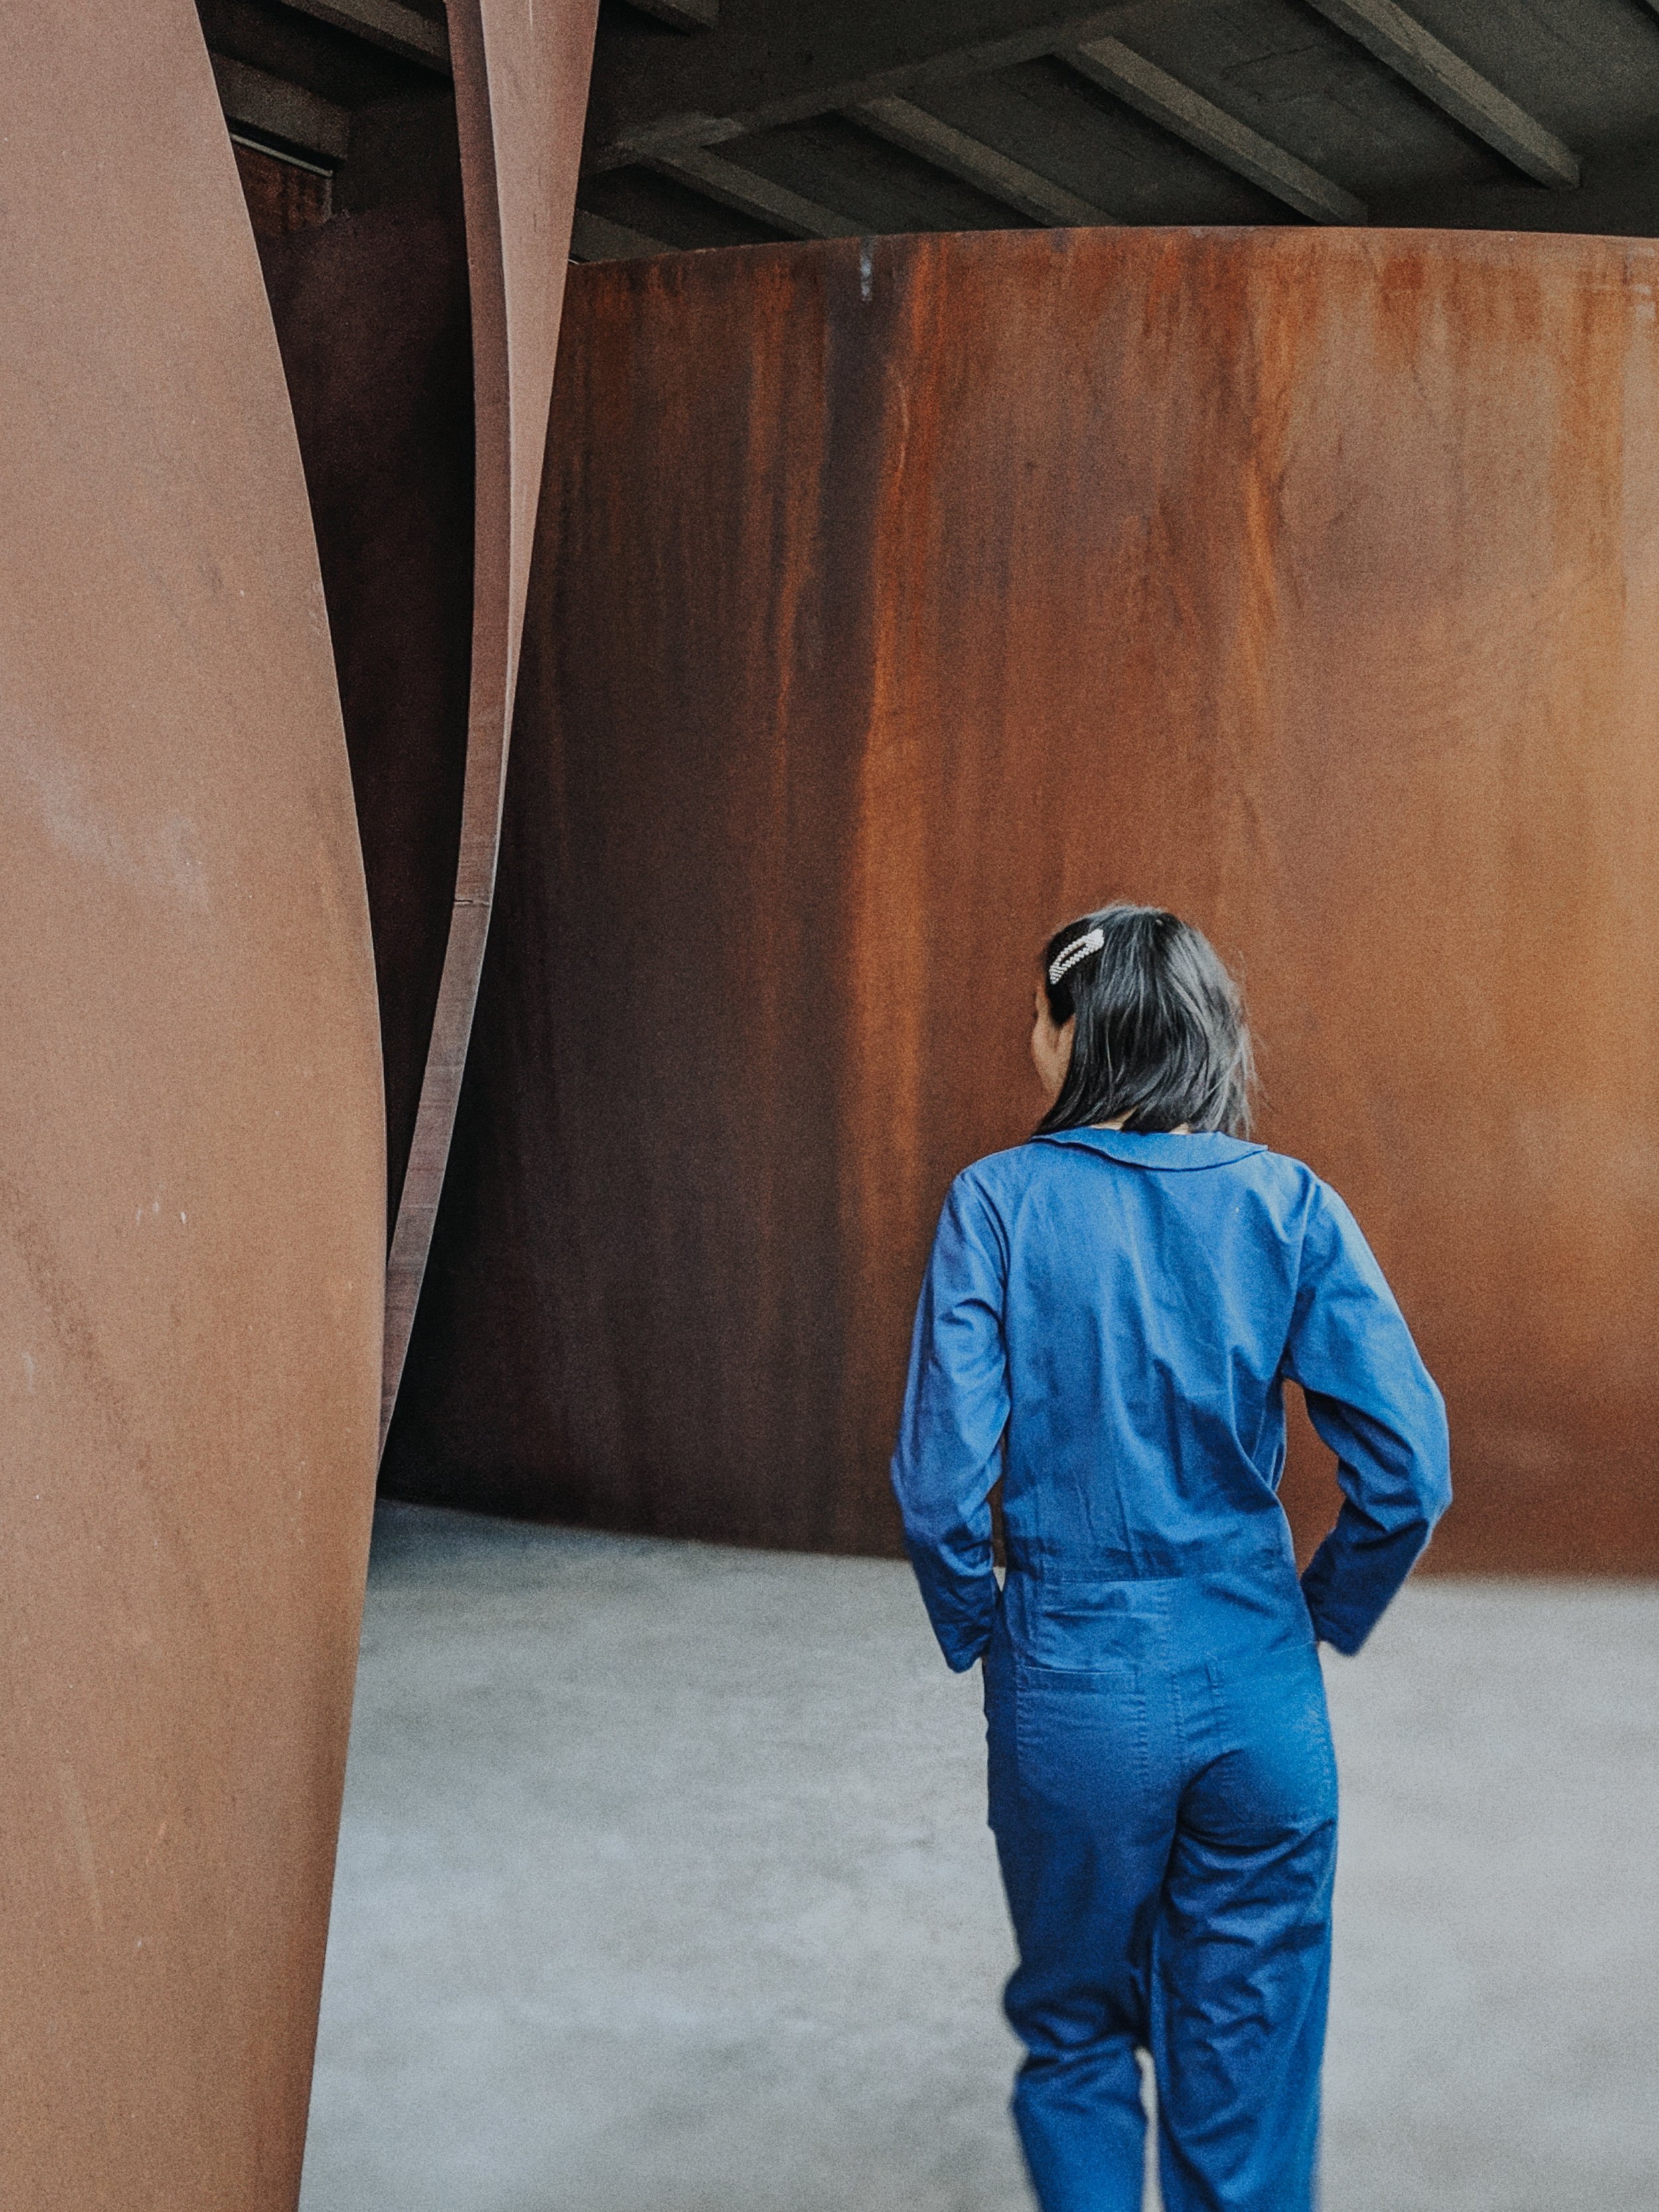 Torqued Ellipse - Richard Serra